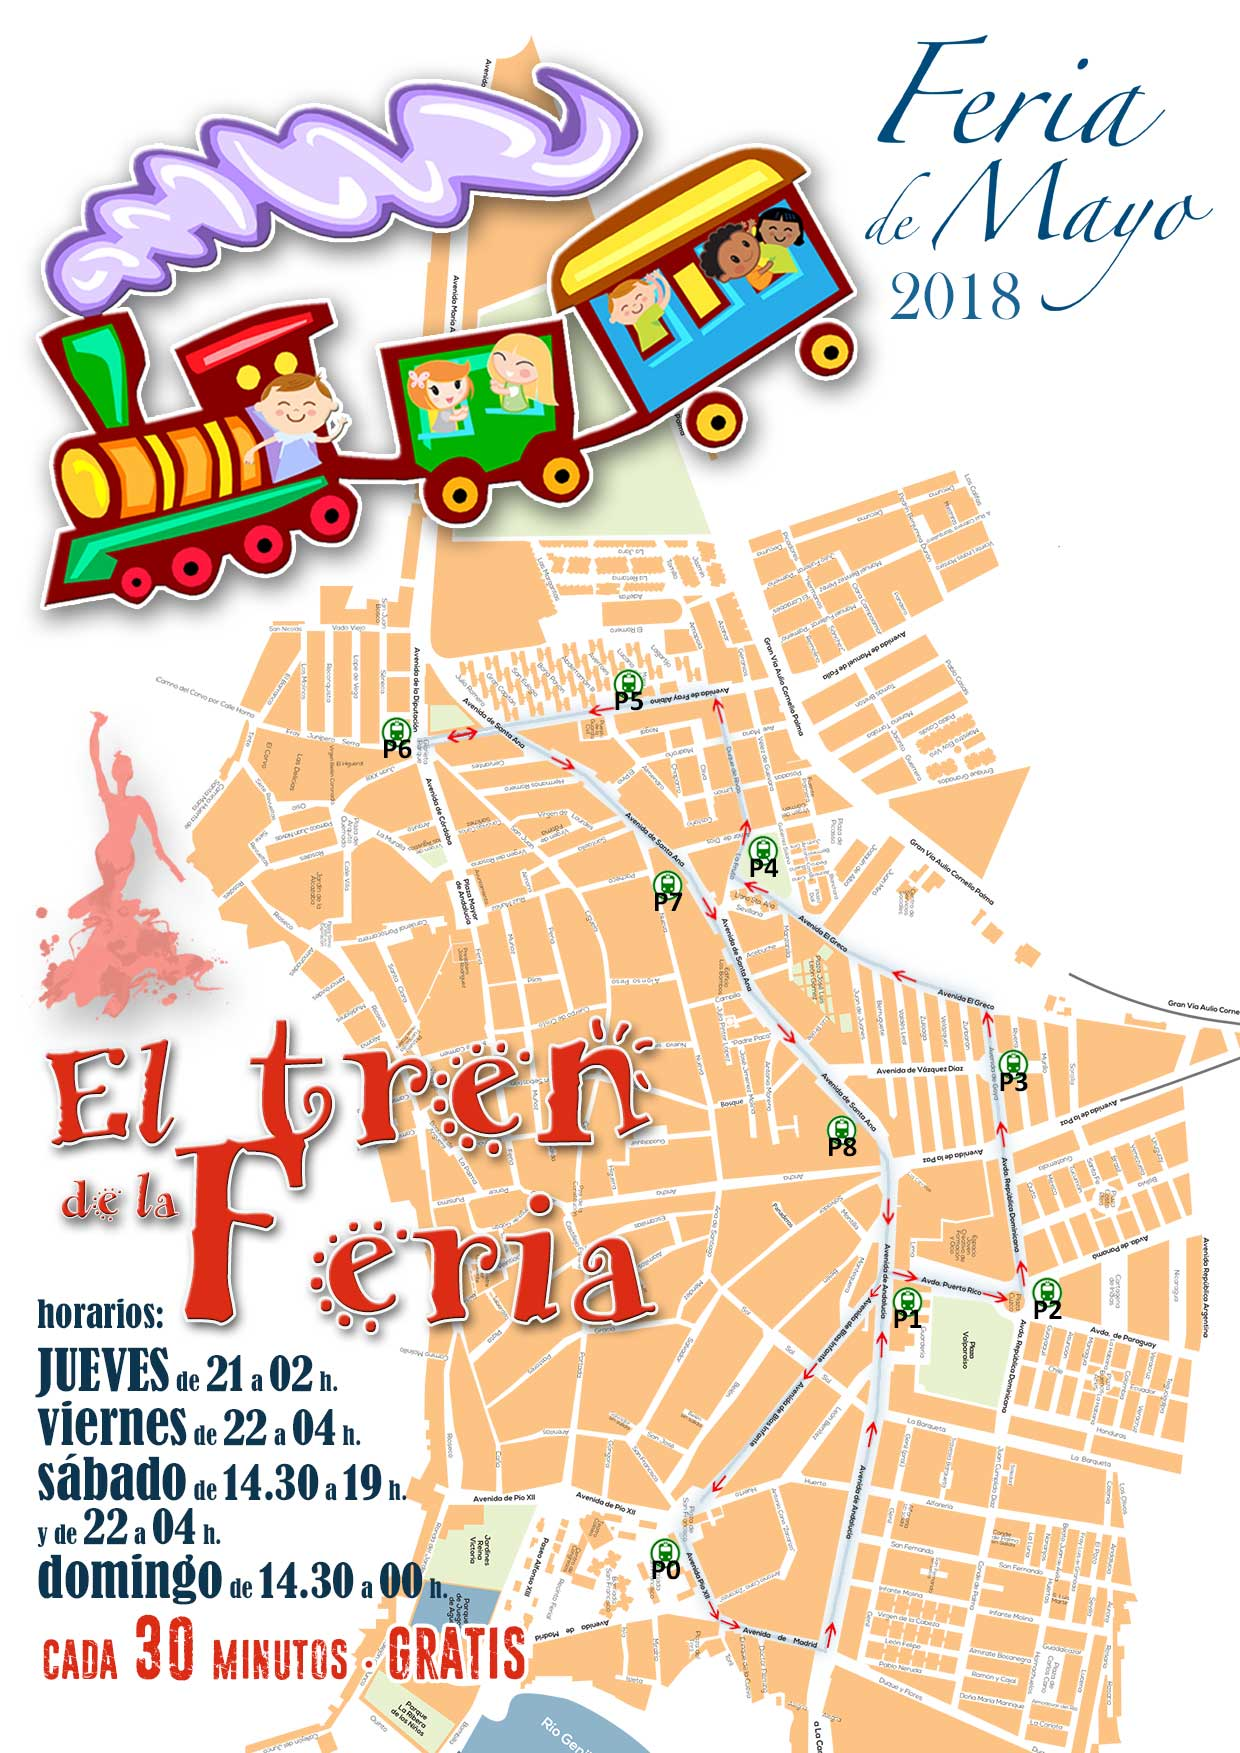 https://www.palmadelrio.es/sites/default/files/web-plano-tren-de-feria-2018.jpg